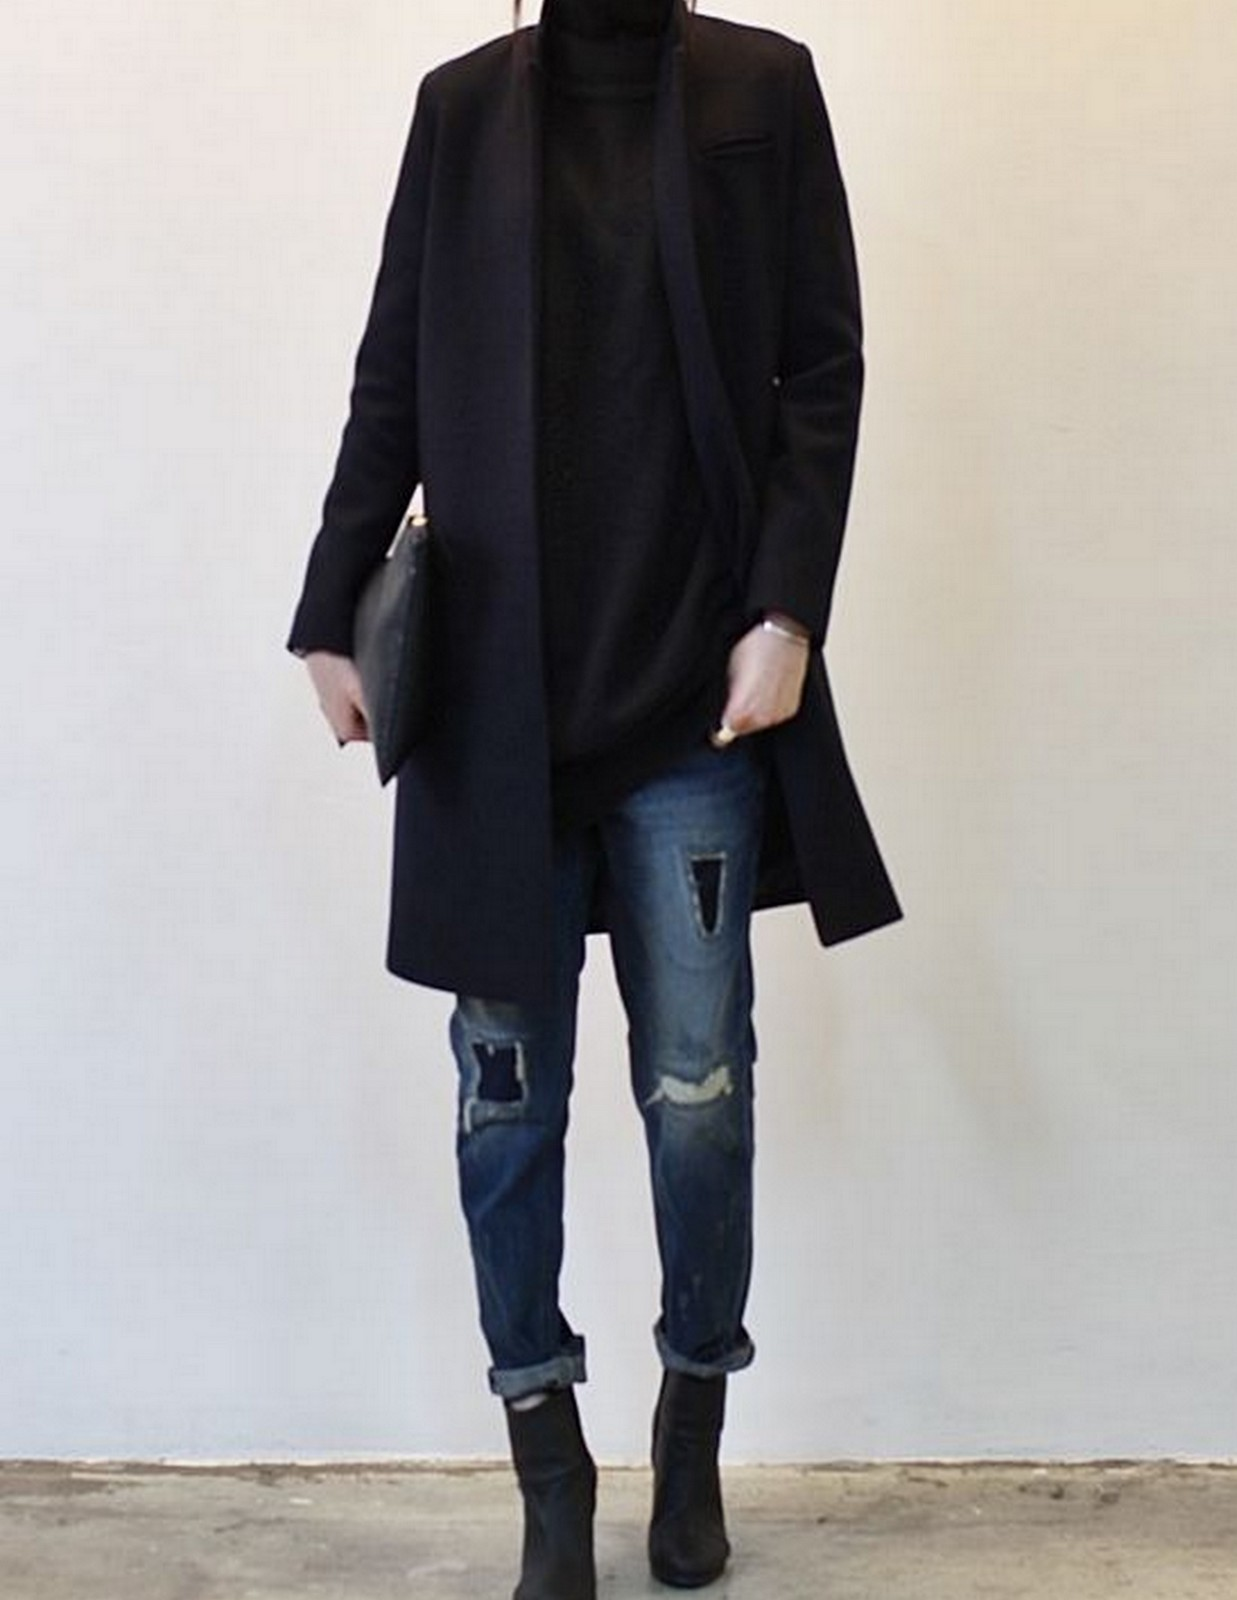 Black + Jeans